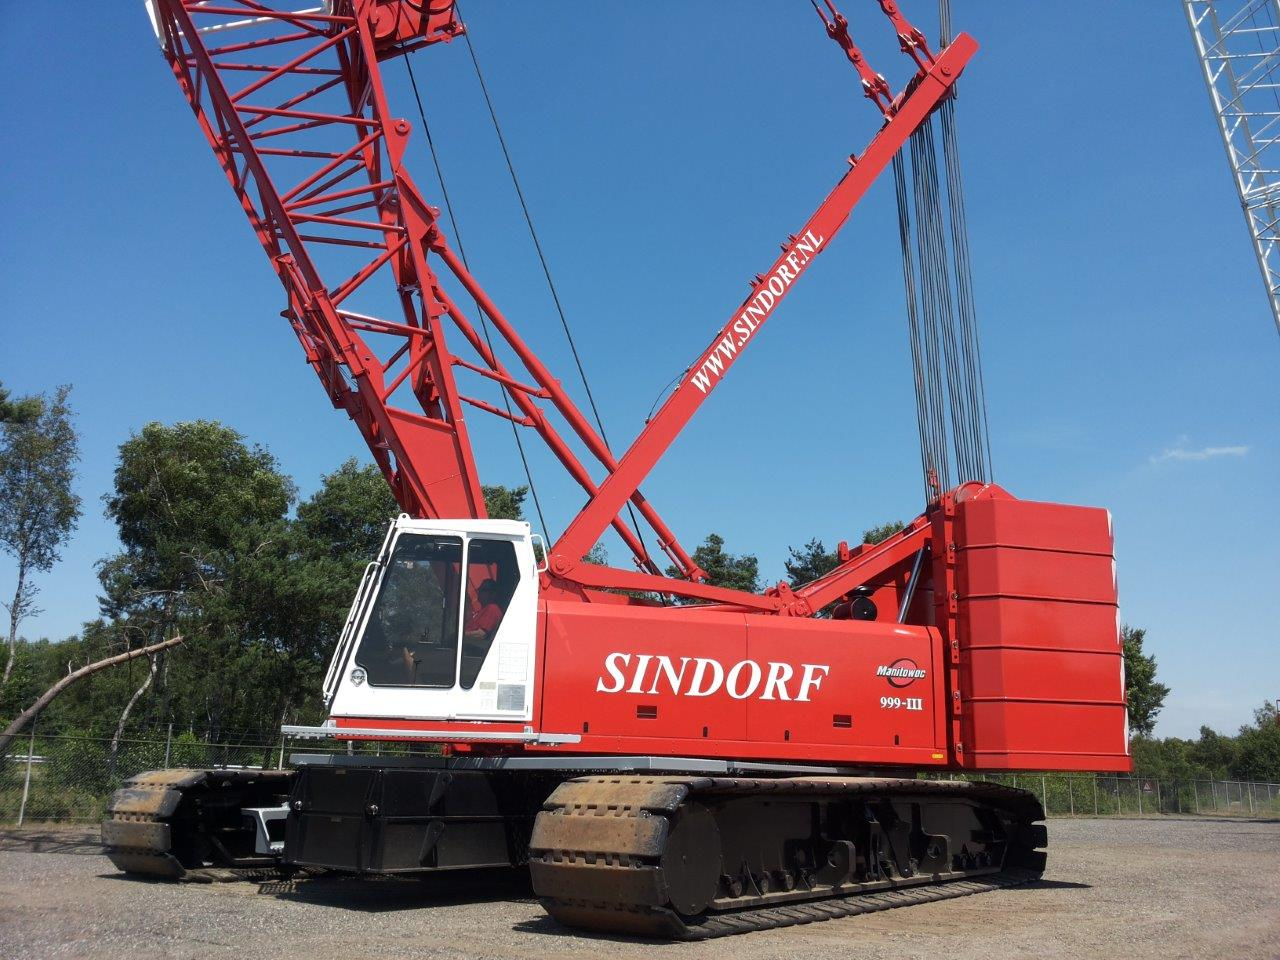 CRAWLER CRANE OPERATOR'S MANUAL - Global Cranes